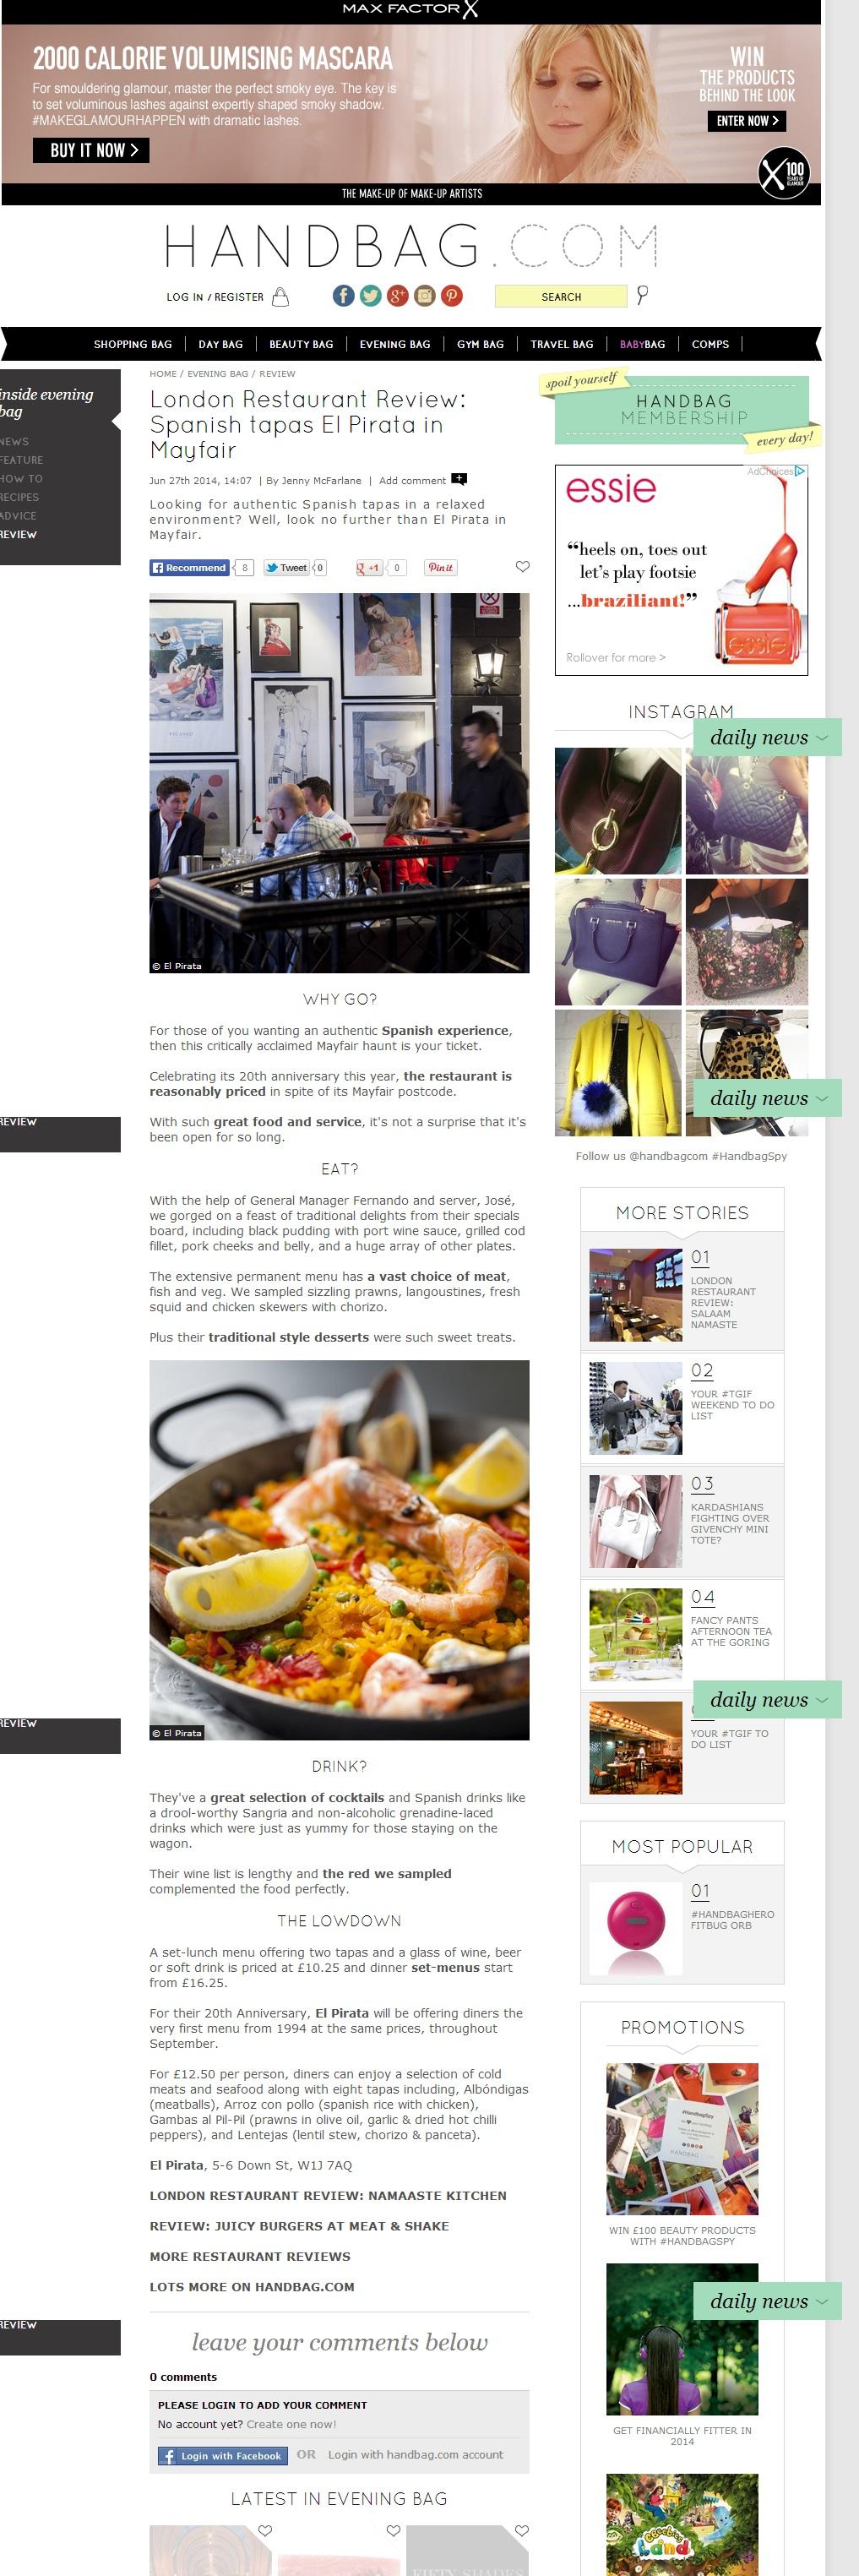 screencapture-www-handbag-com-evening-bag-review-a580826-london-restaurant-review-spanish-tapas-el-pirata-in-mayfair-html